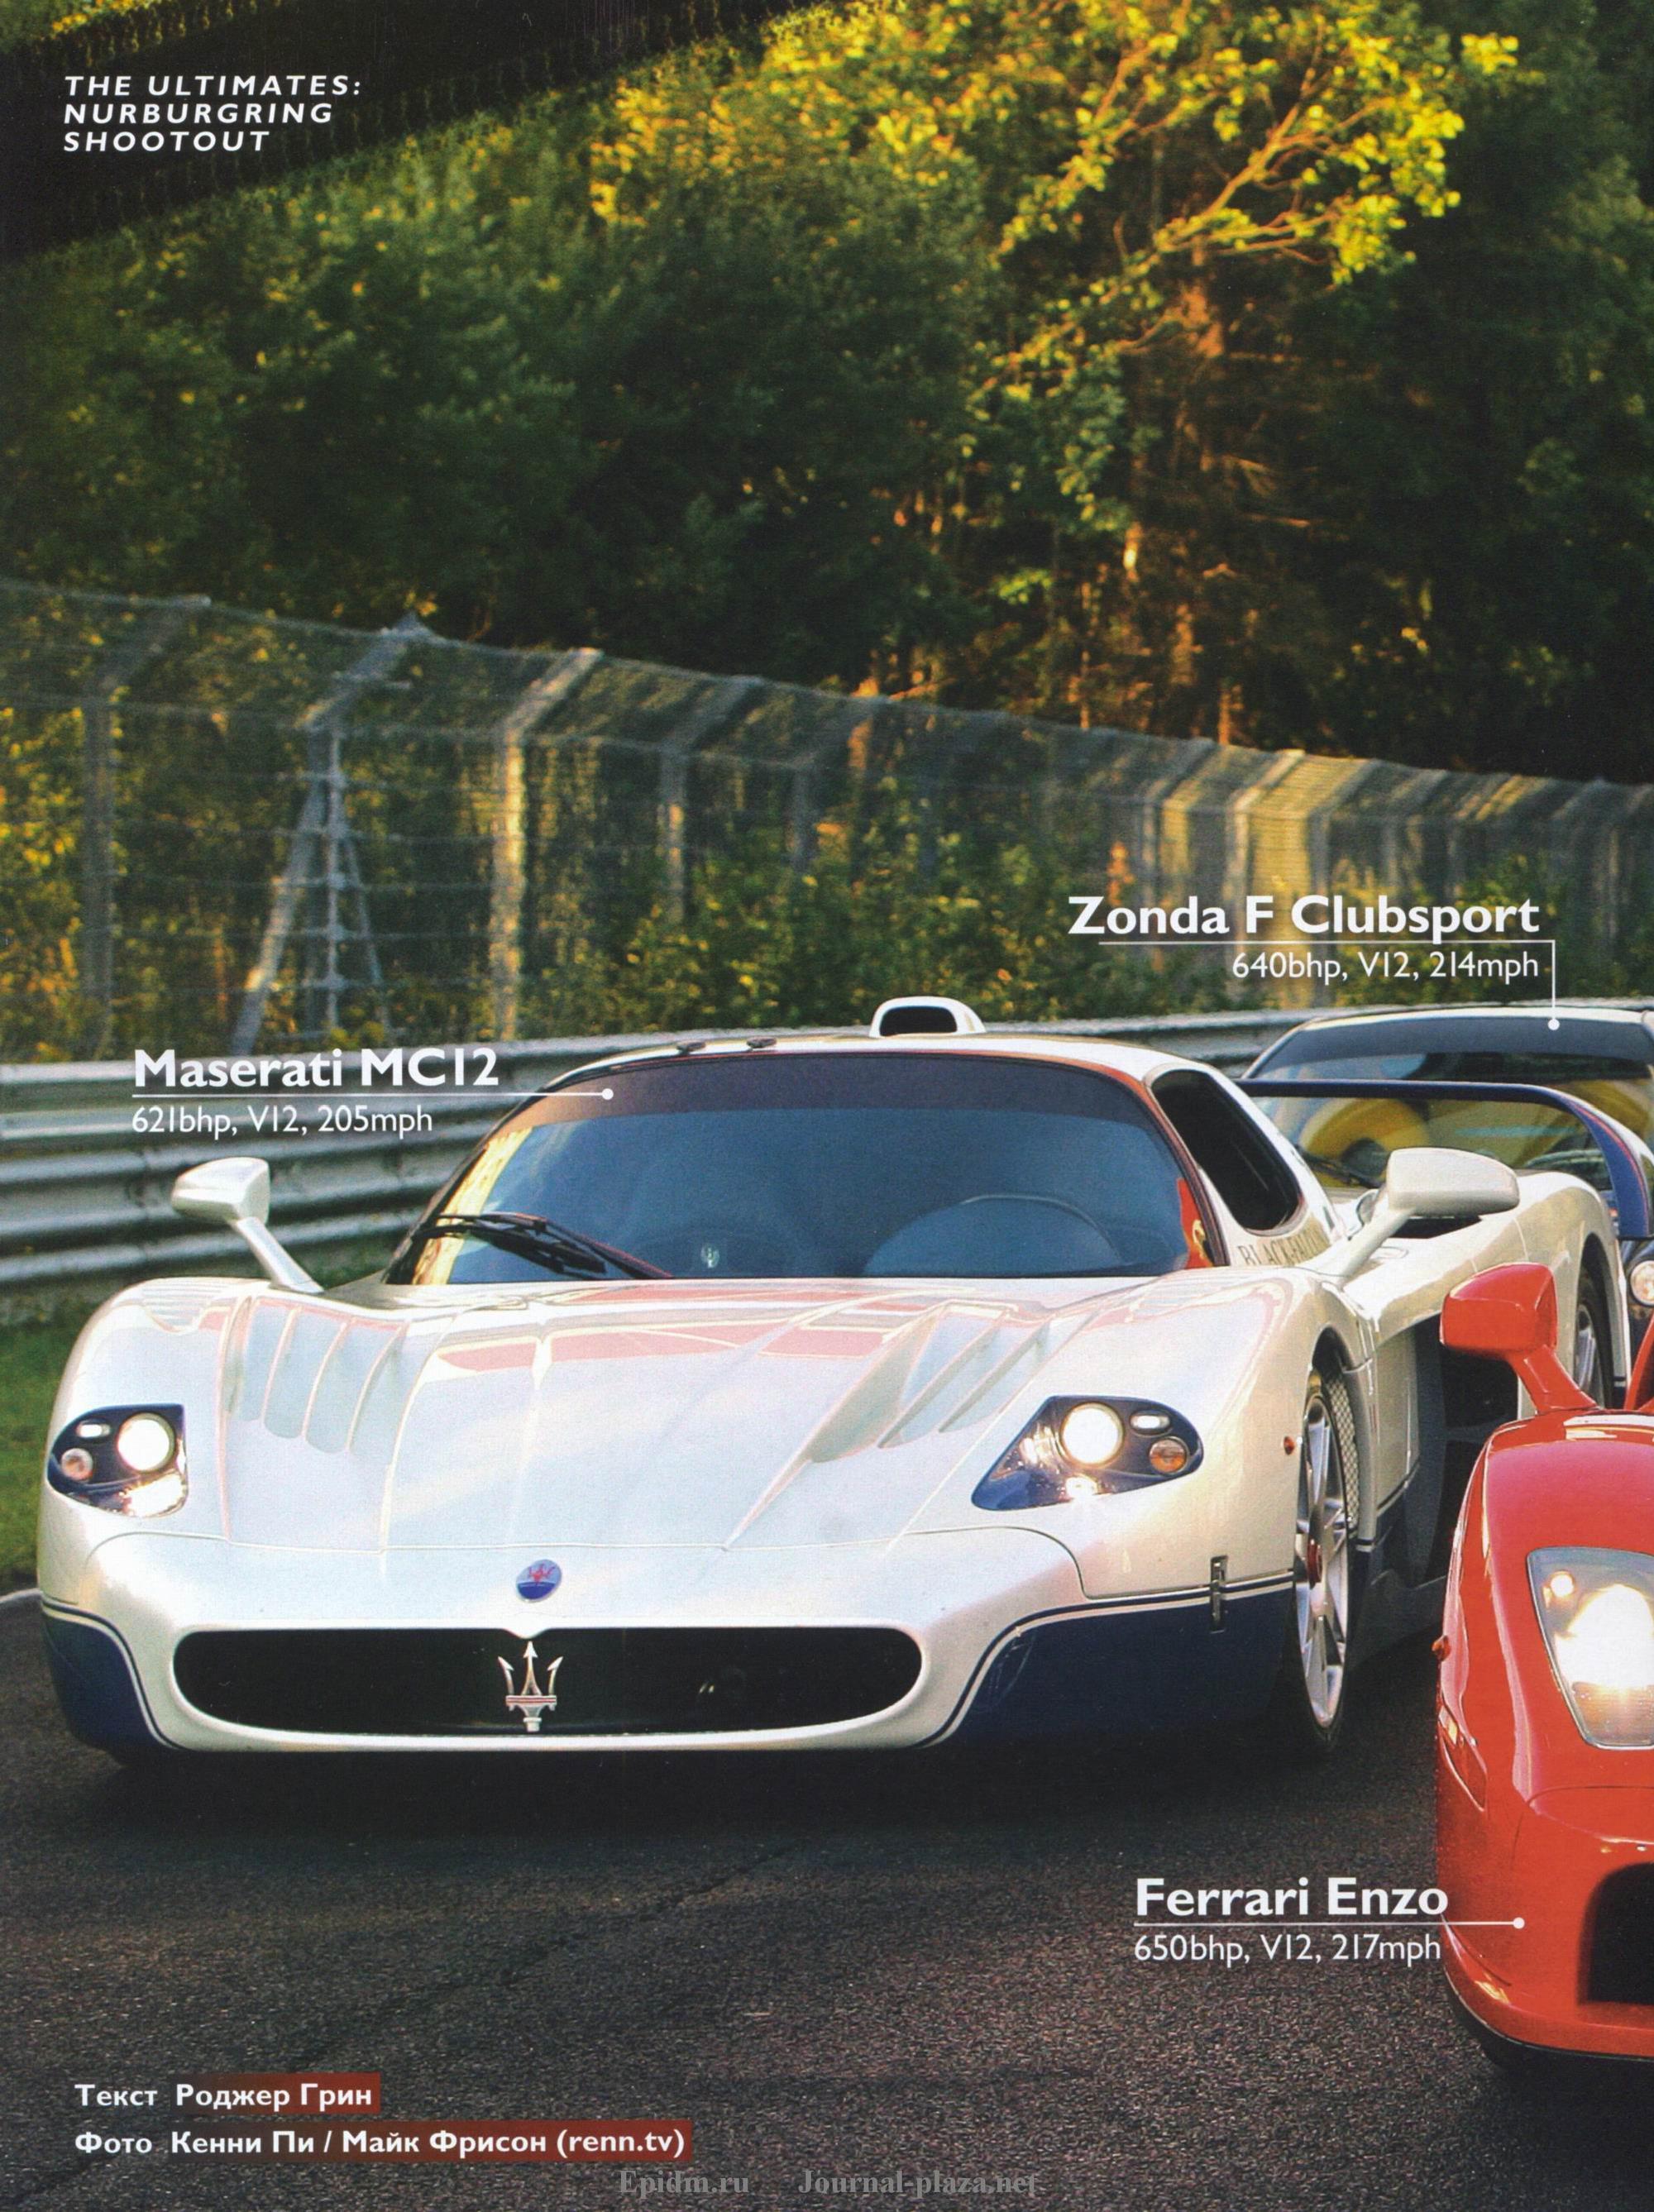 Porsche 980 Carrera Gt Vs Ferrari Enzo Vs Maserati Mc12 Vs